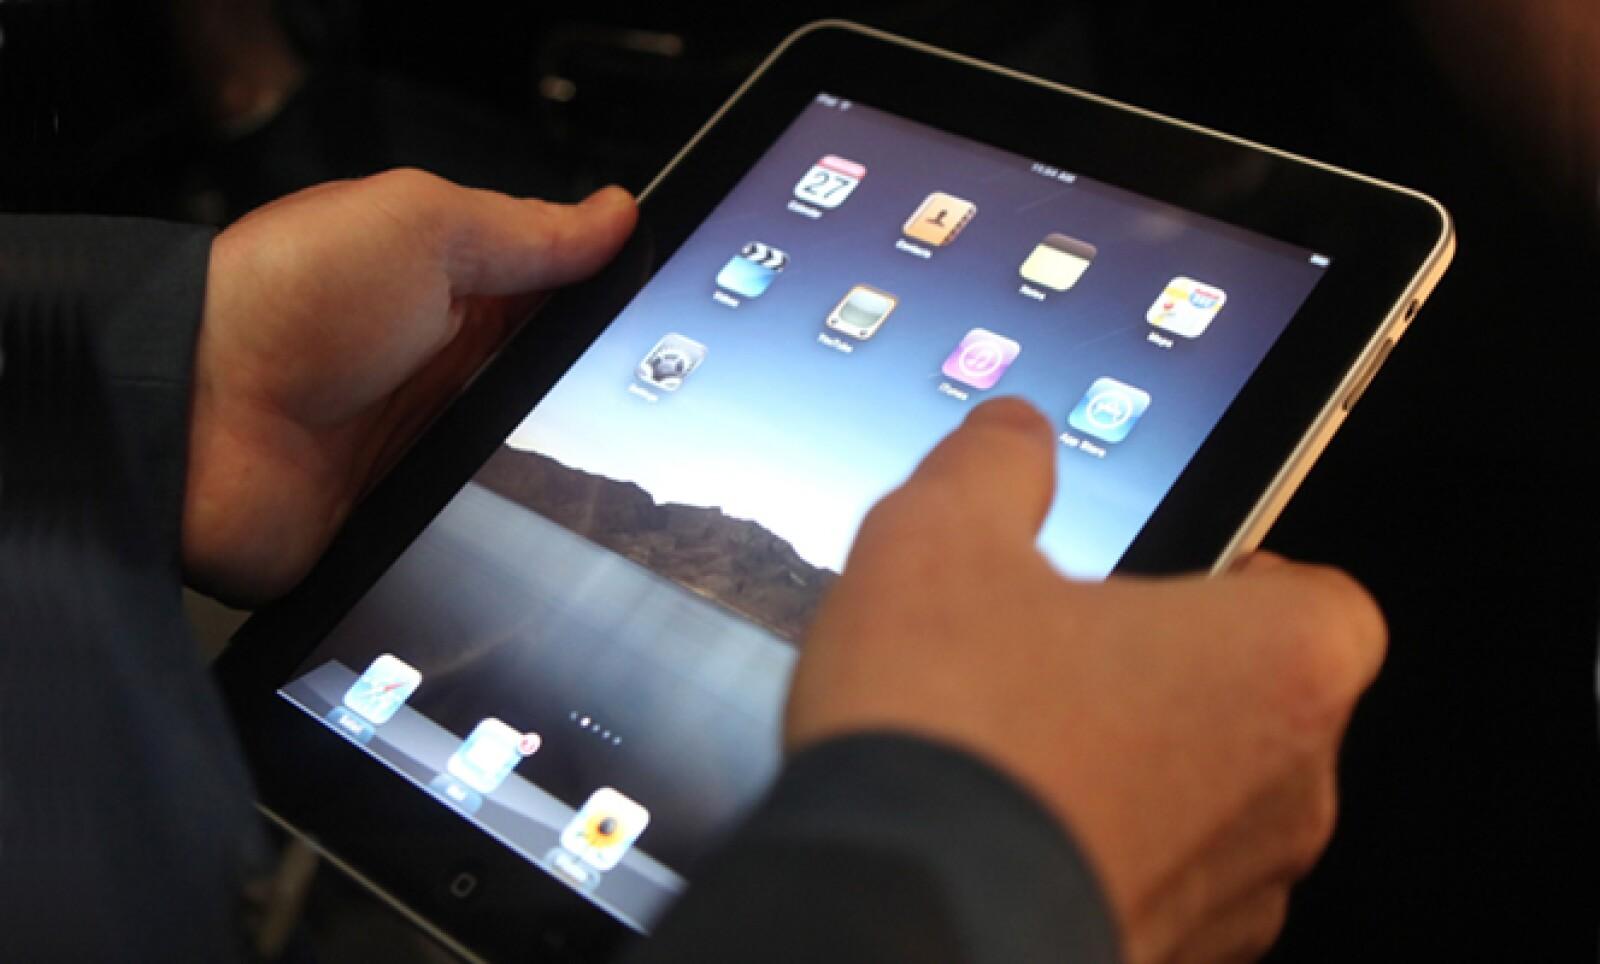 Steve Jobs mostró las funciones del iPad, como su teclado en pantalla. (Foto: Reuters)